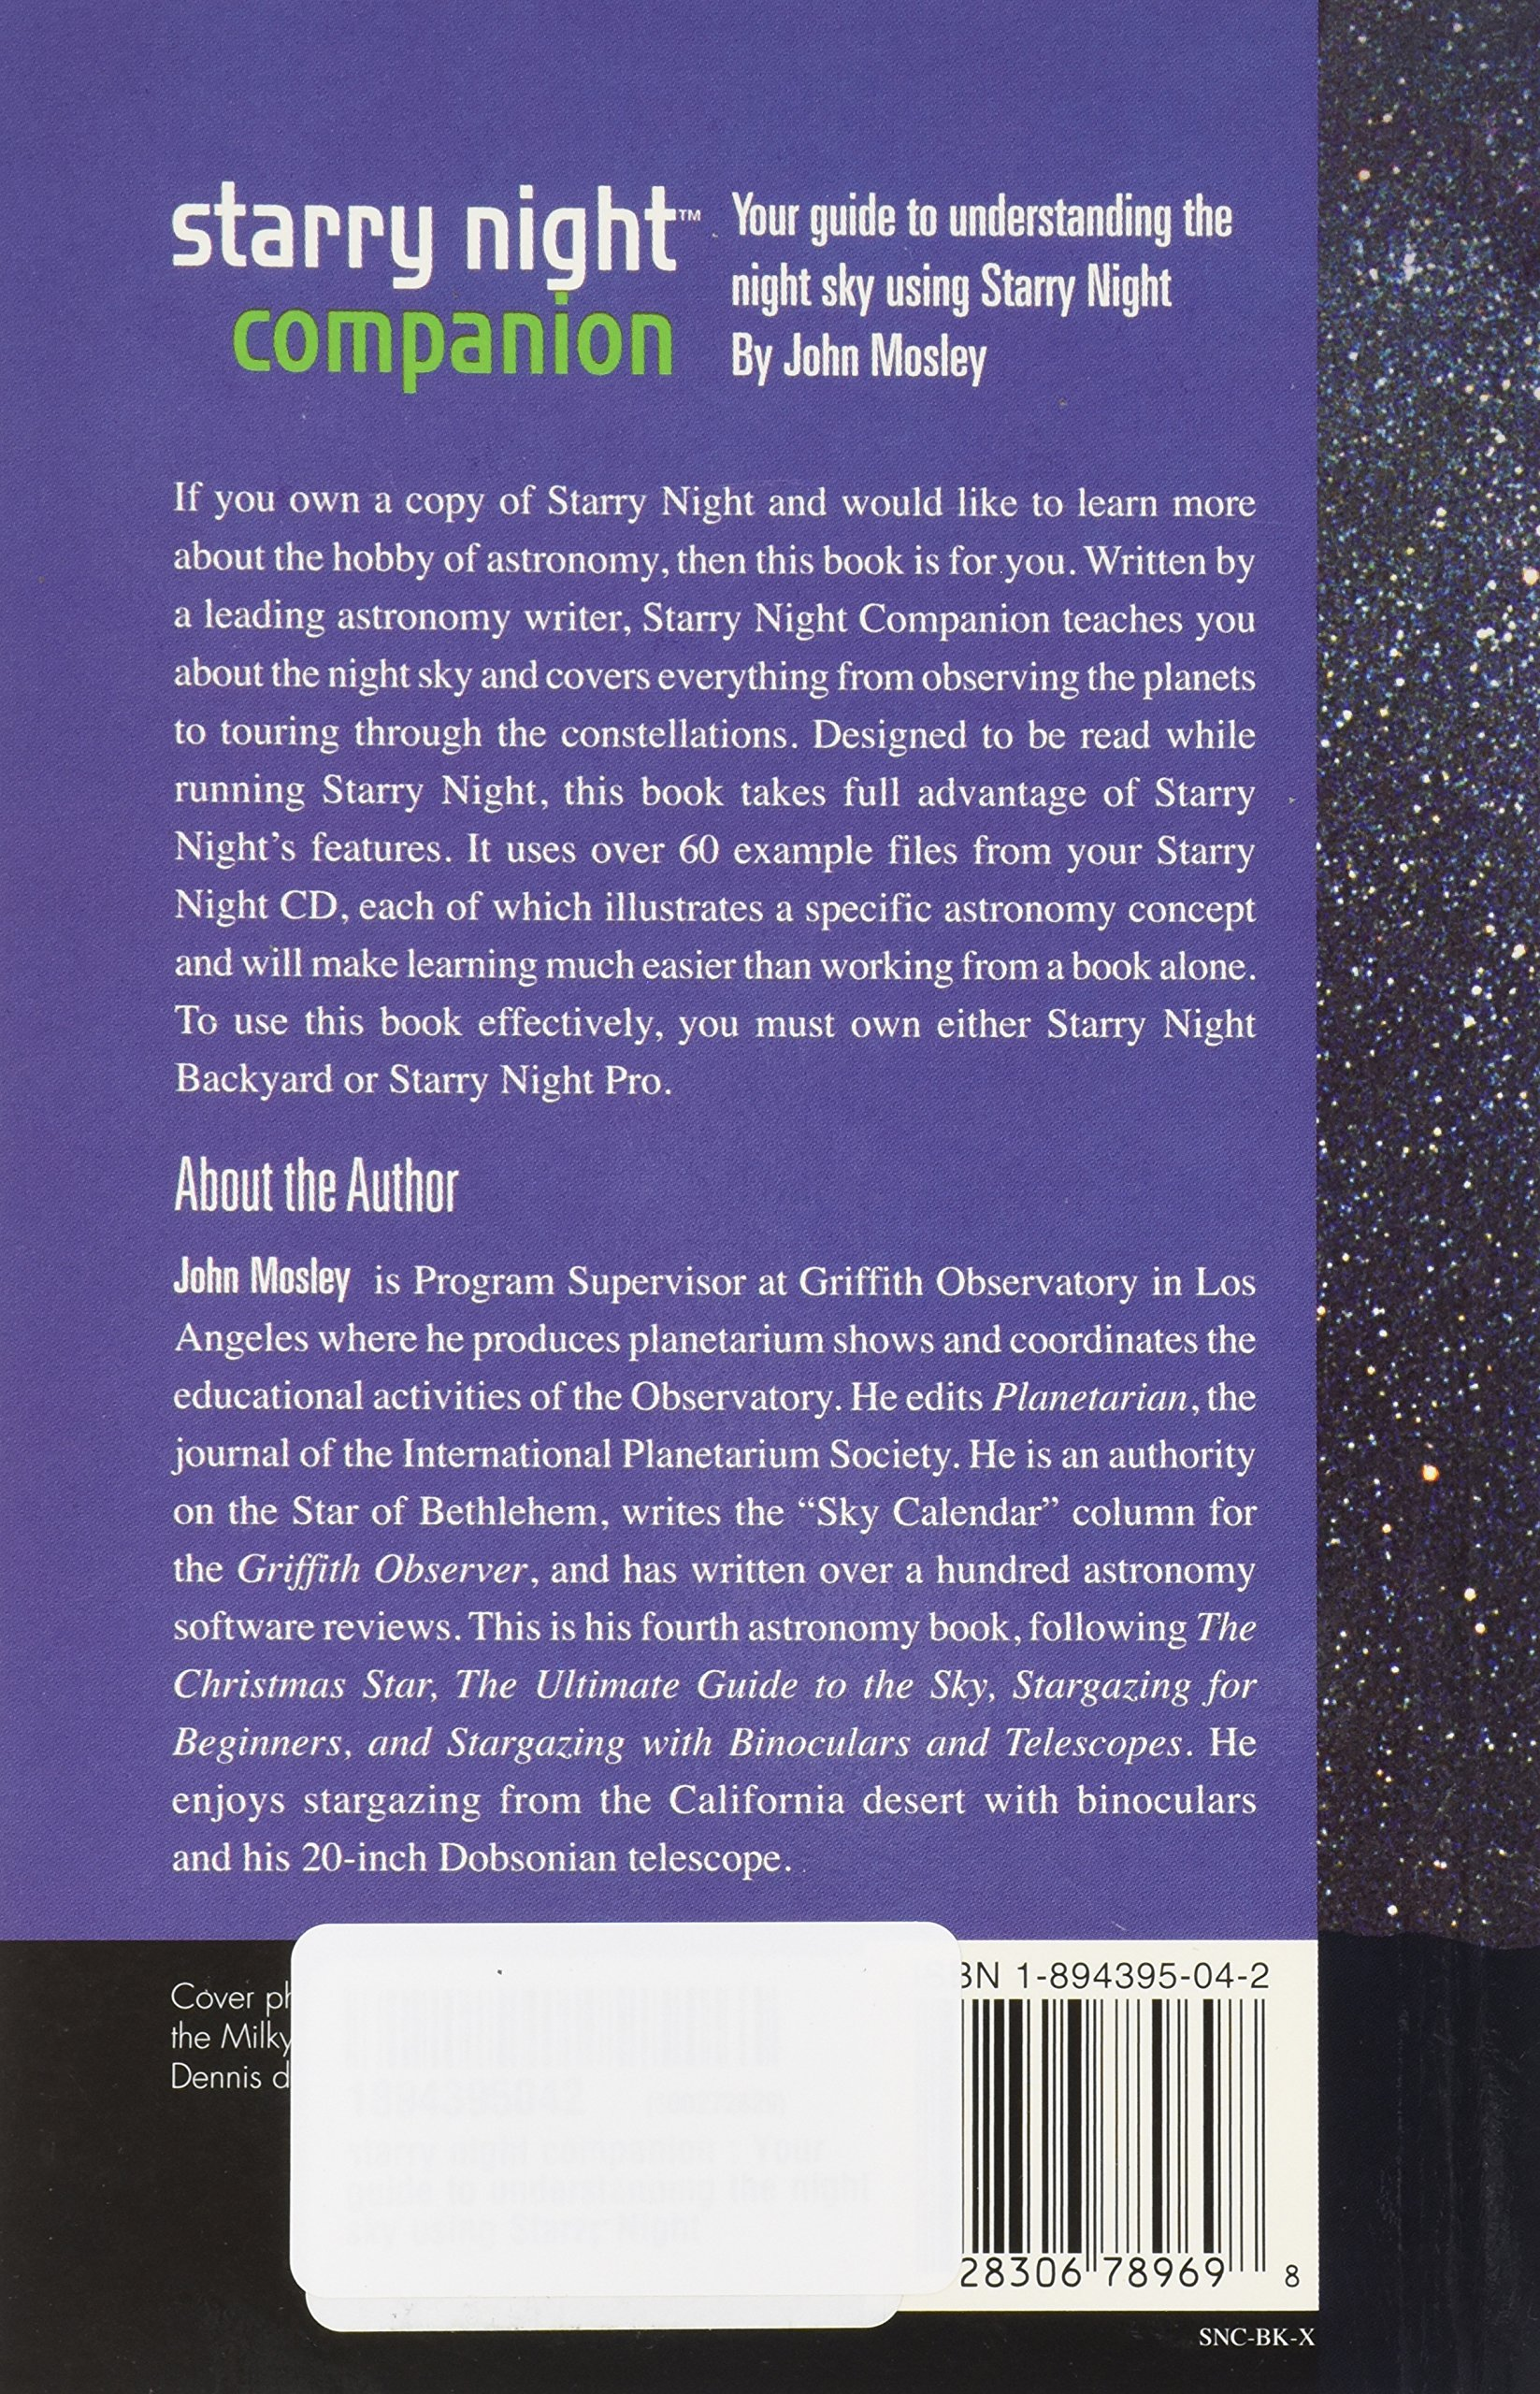 Sll guide lg12 ebook array starry guide computer exercises ebook rh starry guide computer exercises ebook esoulk de fandeluxe Images